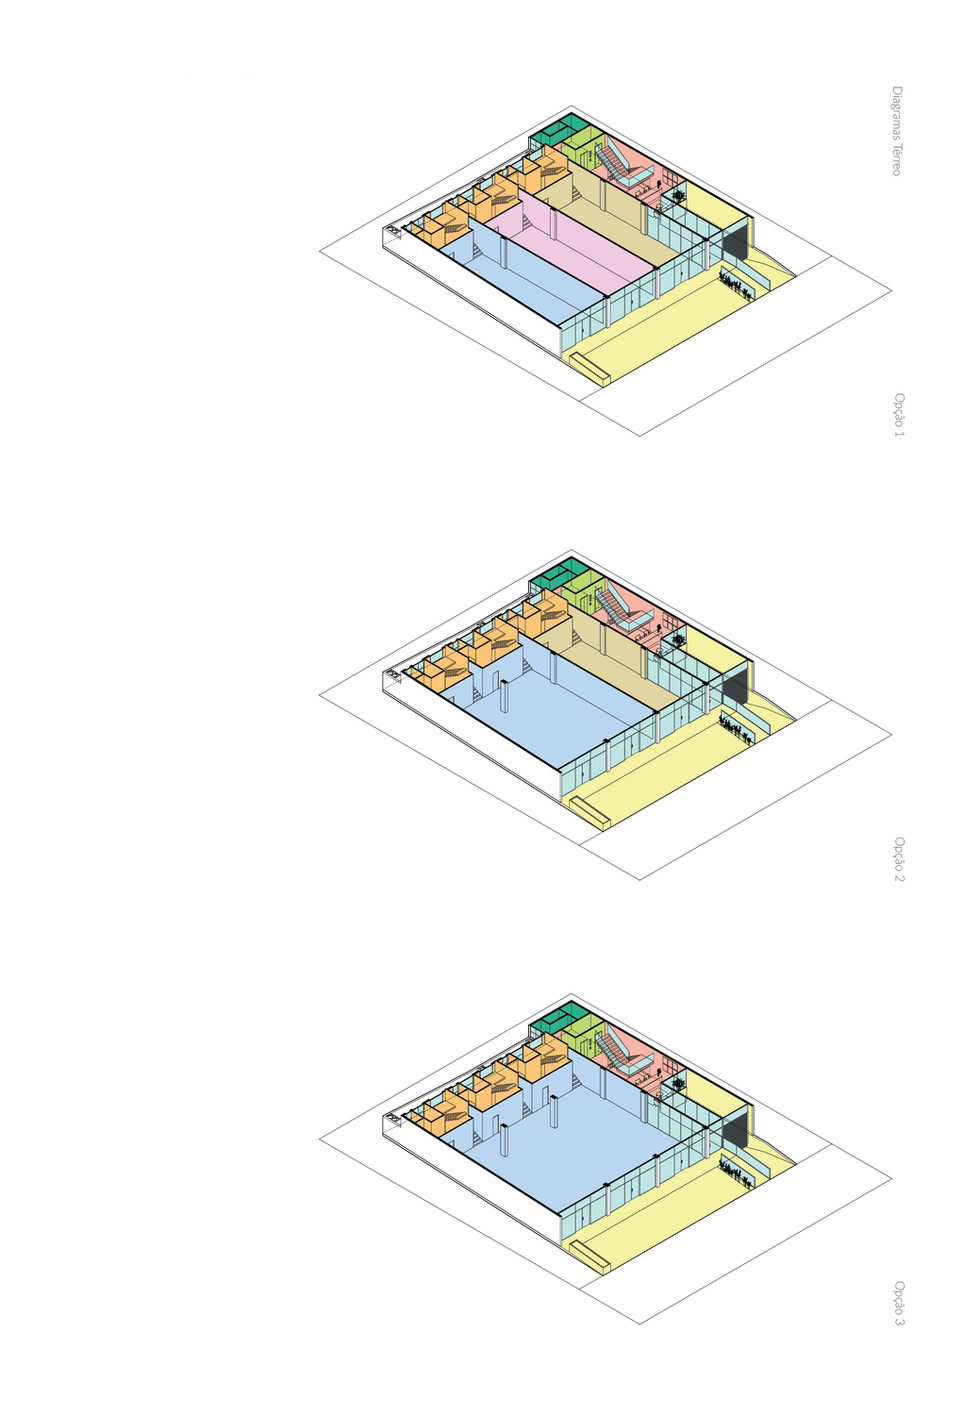 Diagramas Sem Legenda 01.jpg